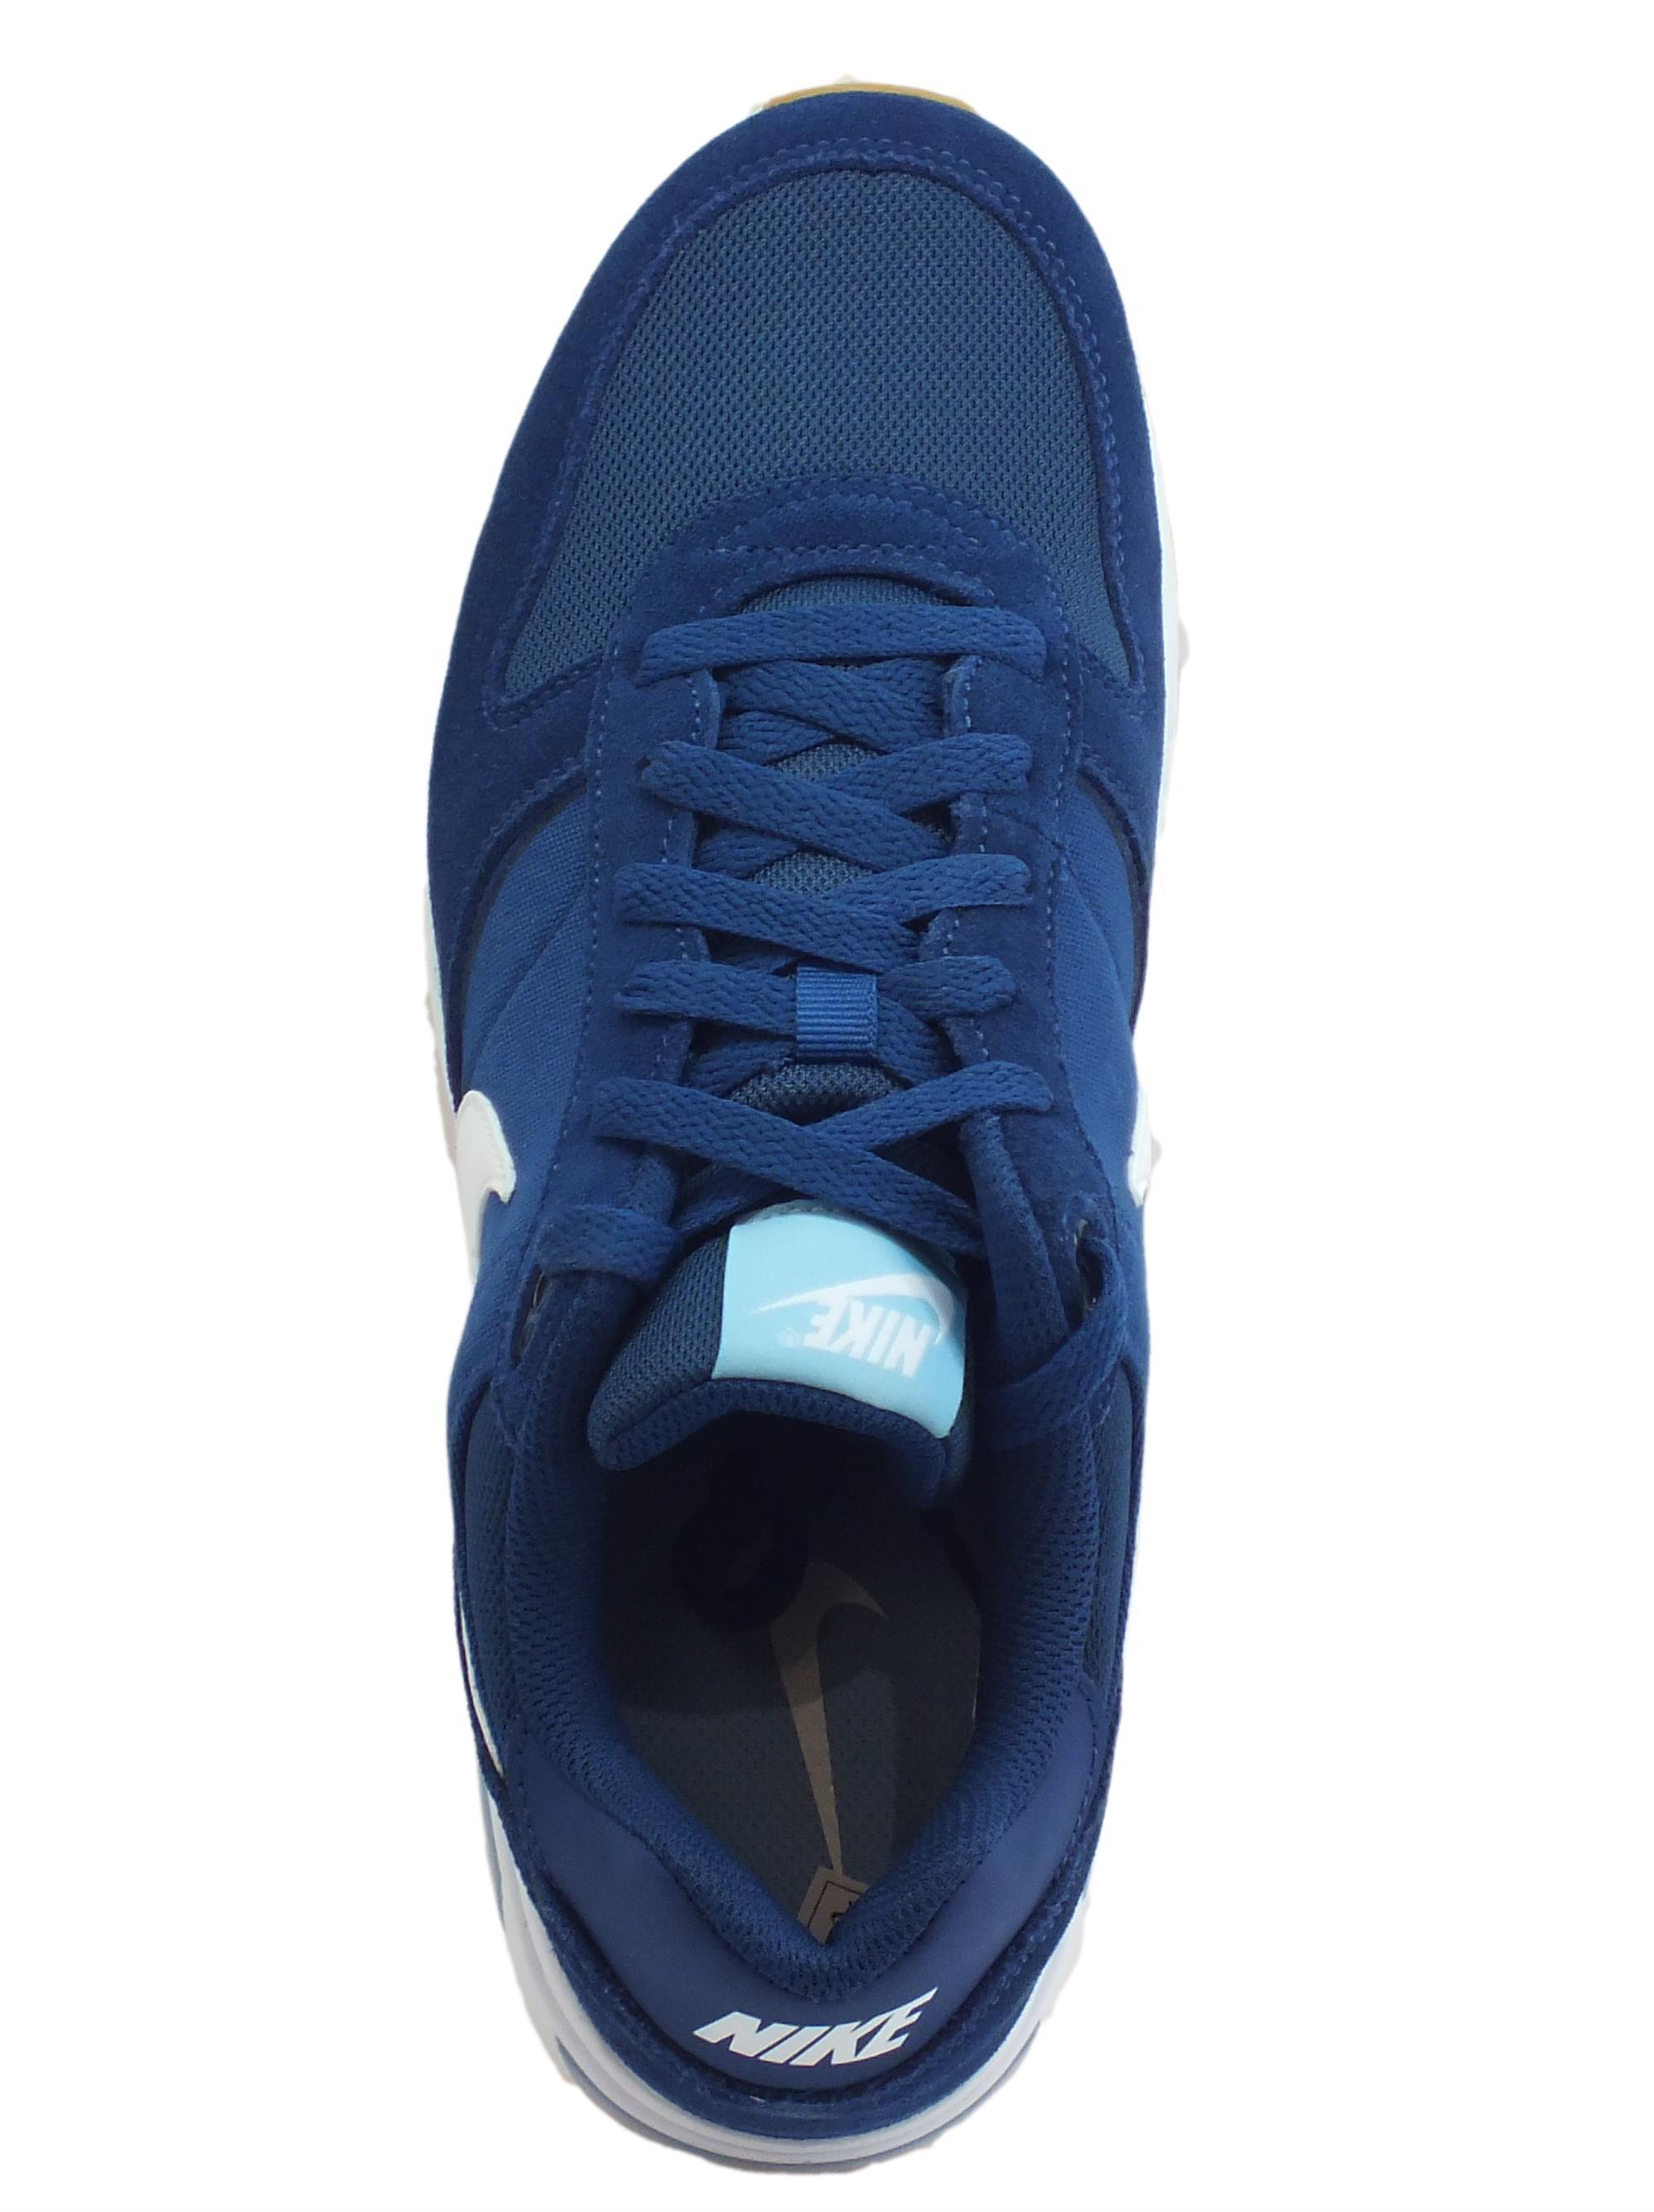 Scarpe sportive Nike NightGazer uomo camoscio tessuto blu - Vitiello ... d6dad207542